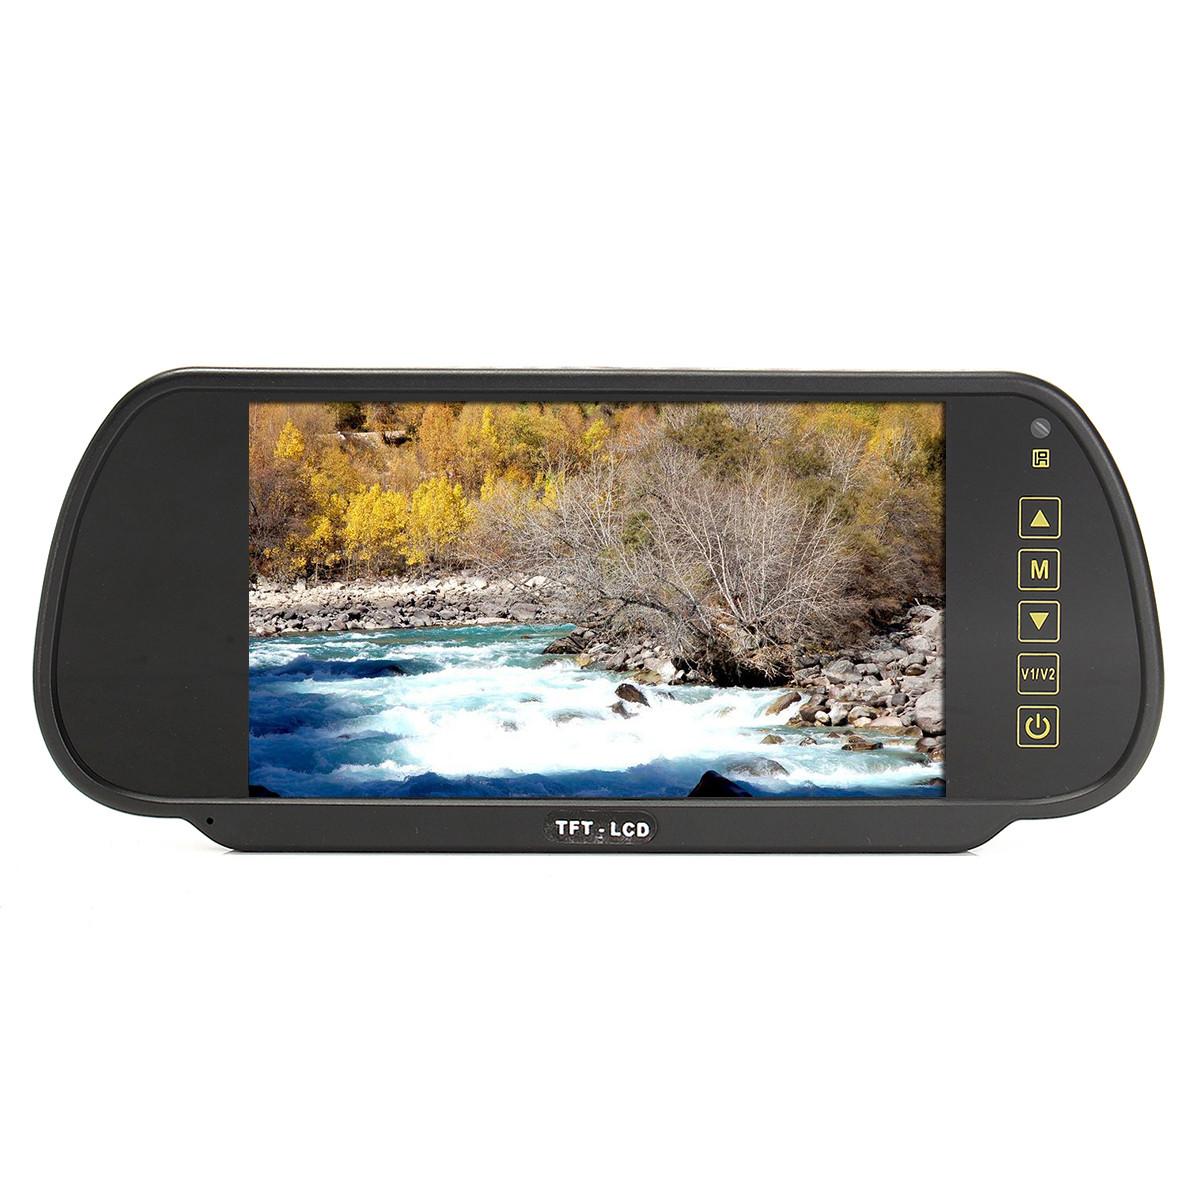 7 дюймов TFT LCD Авто Зеркало заднего вида Монитор для парковки заднего хода камера Комплект и видеомагнитофон DVD-1TopShop